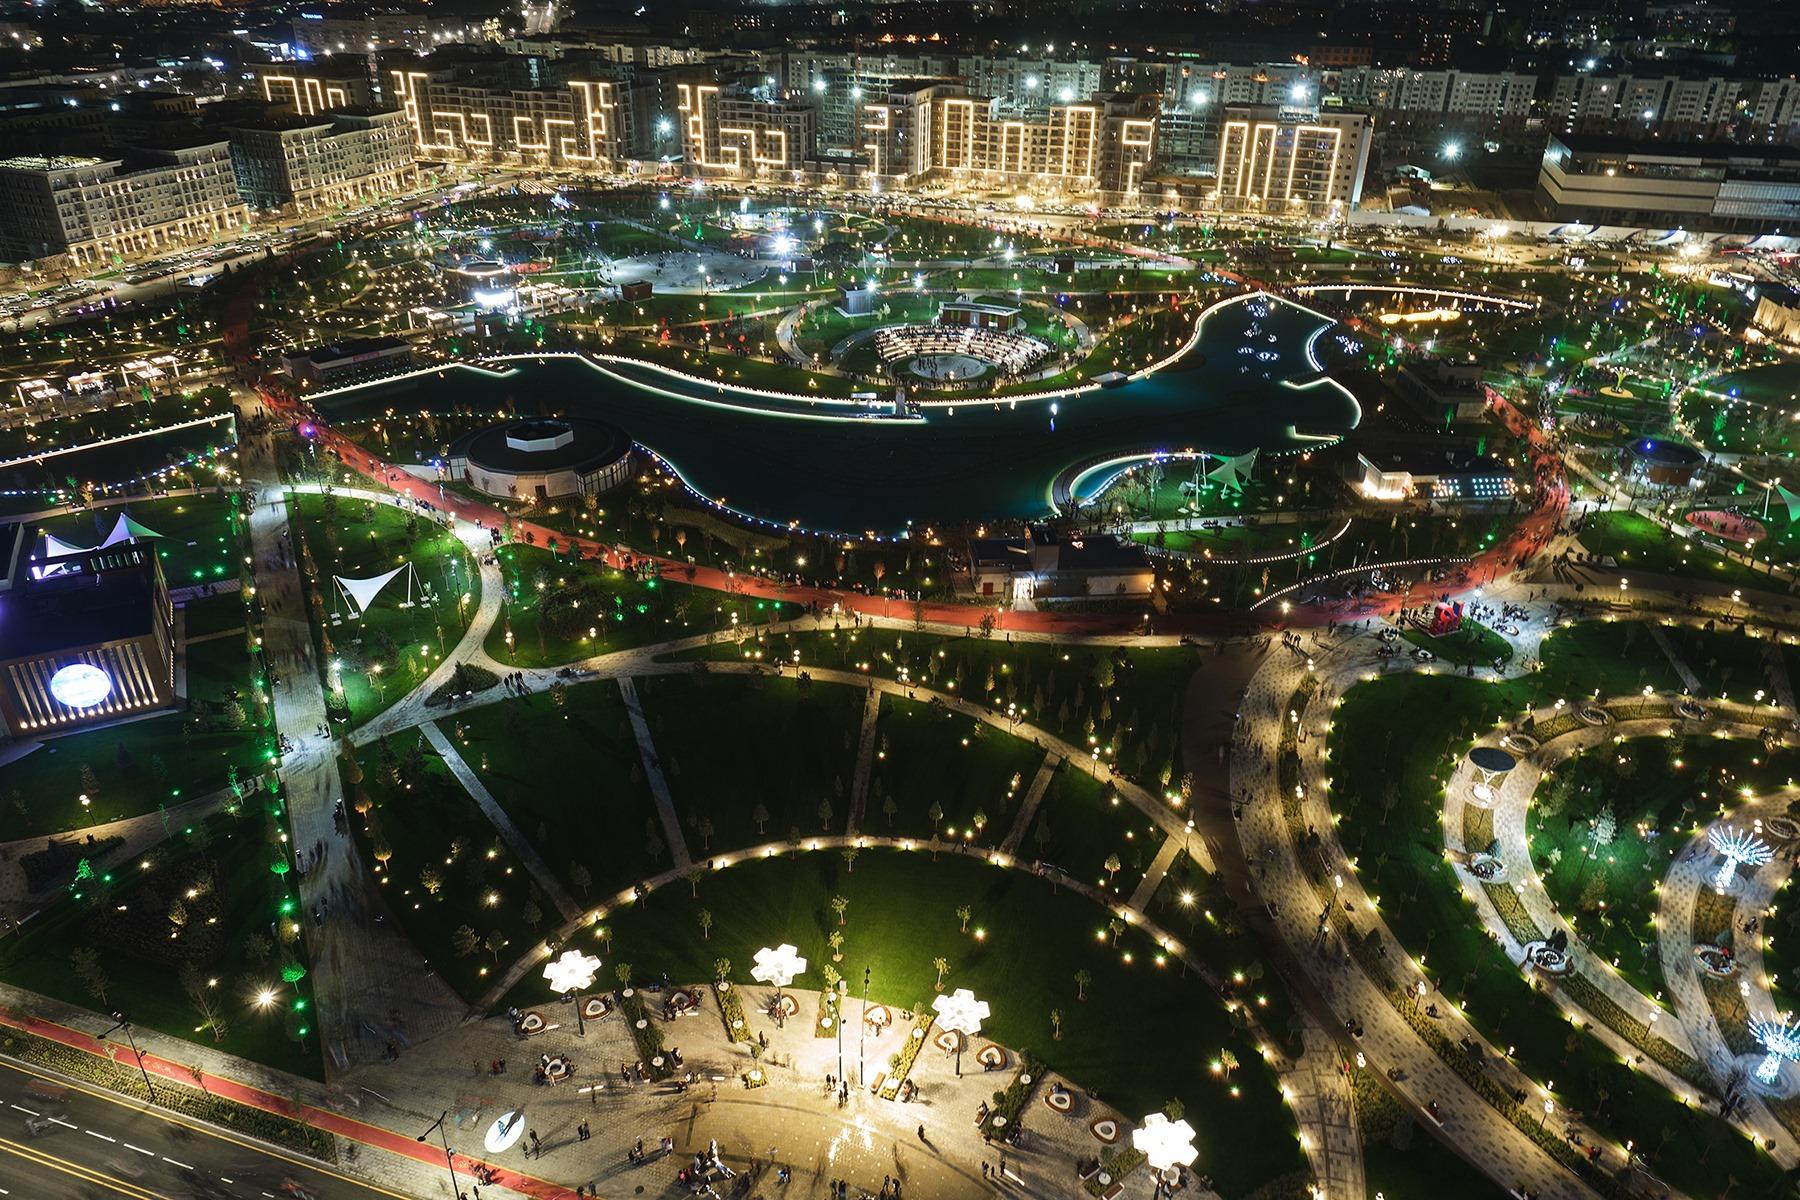 File:Tashkent City Park at night 2019.jpg - Wikimedia Commons